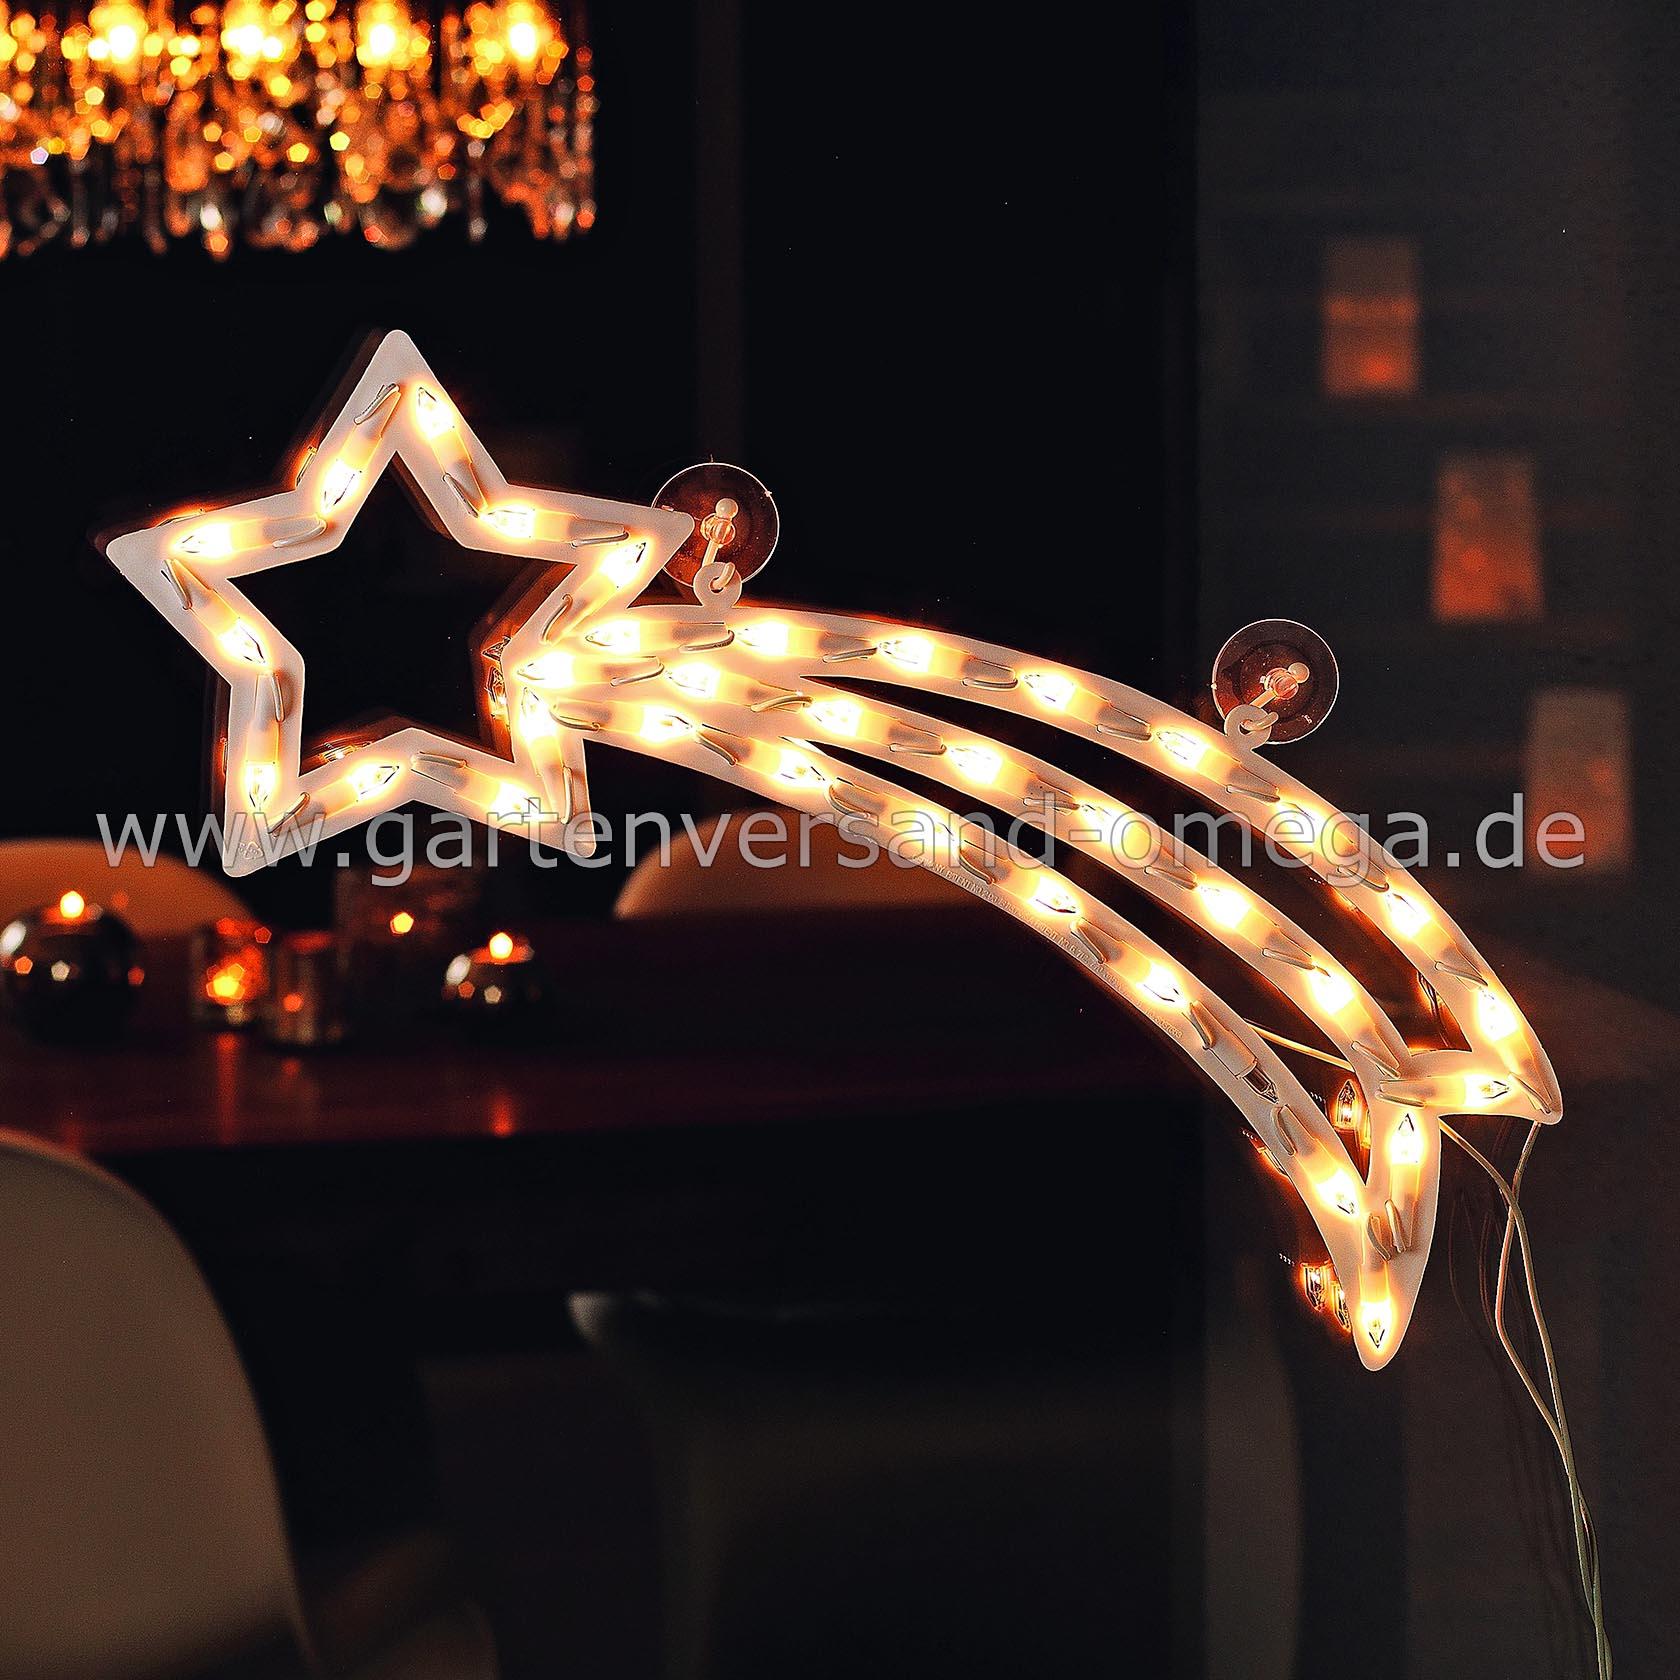 Full Size of Led Fenstersilhouette Komet Weihnachtsbeleuchtung Fr Fenster Standardmaße Polnische Beleuchtung Wärmeschutzfolie Drutex Alu Einbruchschutz Nachrüsten Fenster Weihnachtsbeleuchtung Fenster